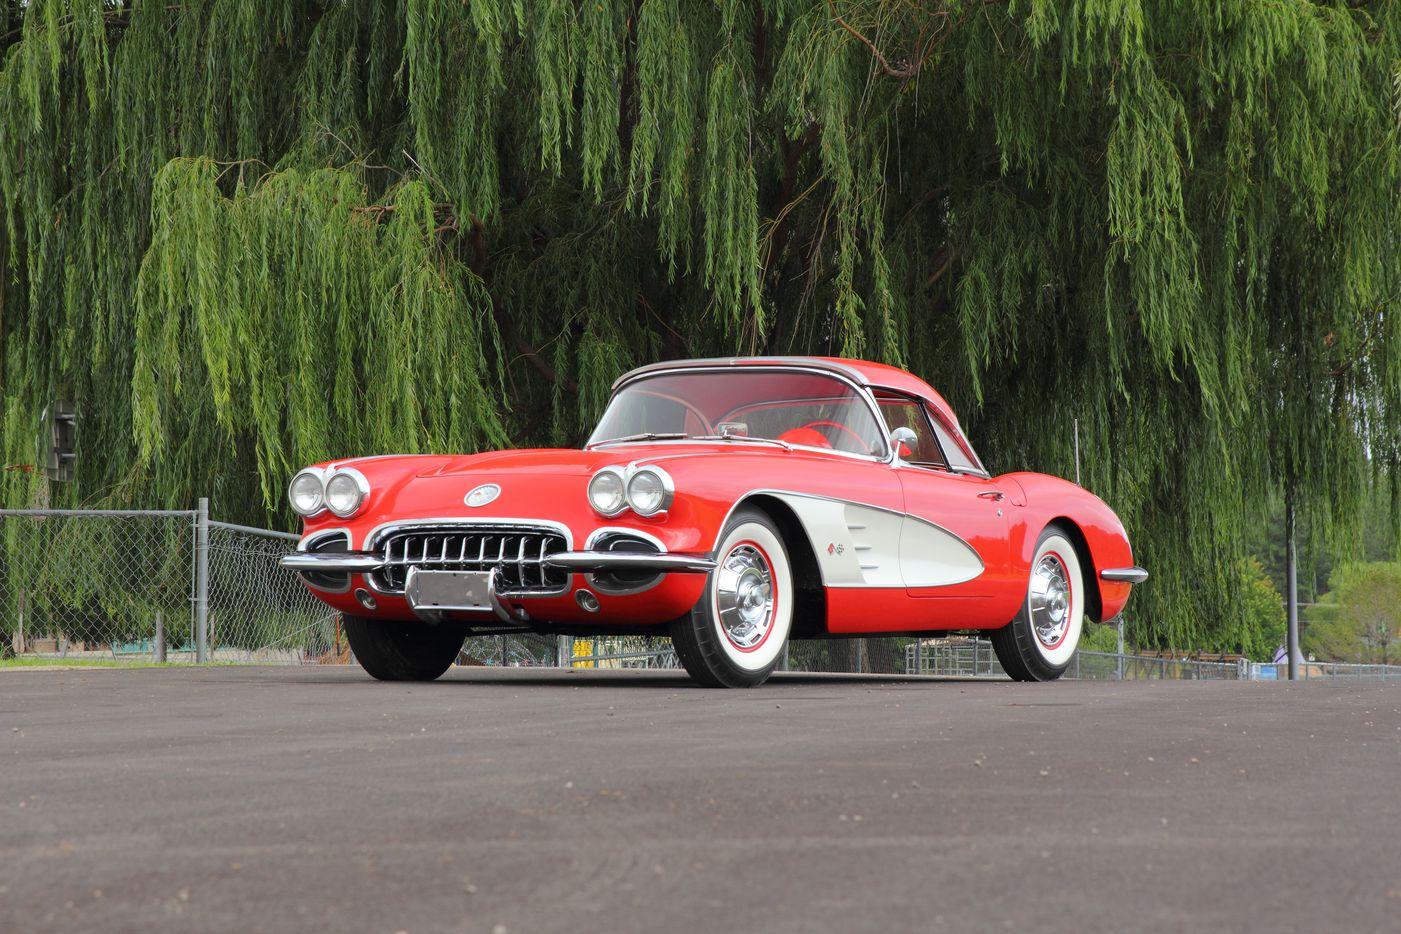 Lot W62 1960 Chevrolet Corvette Convertible (Mecum)